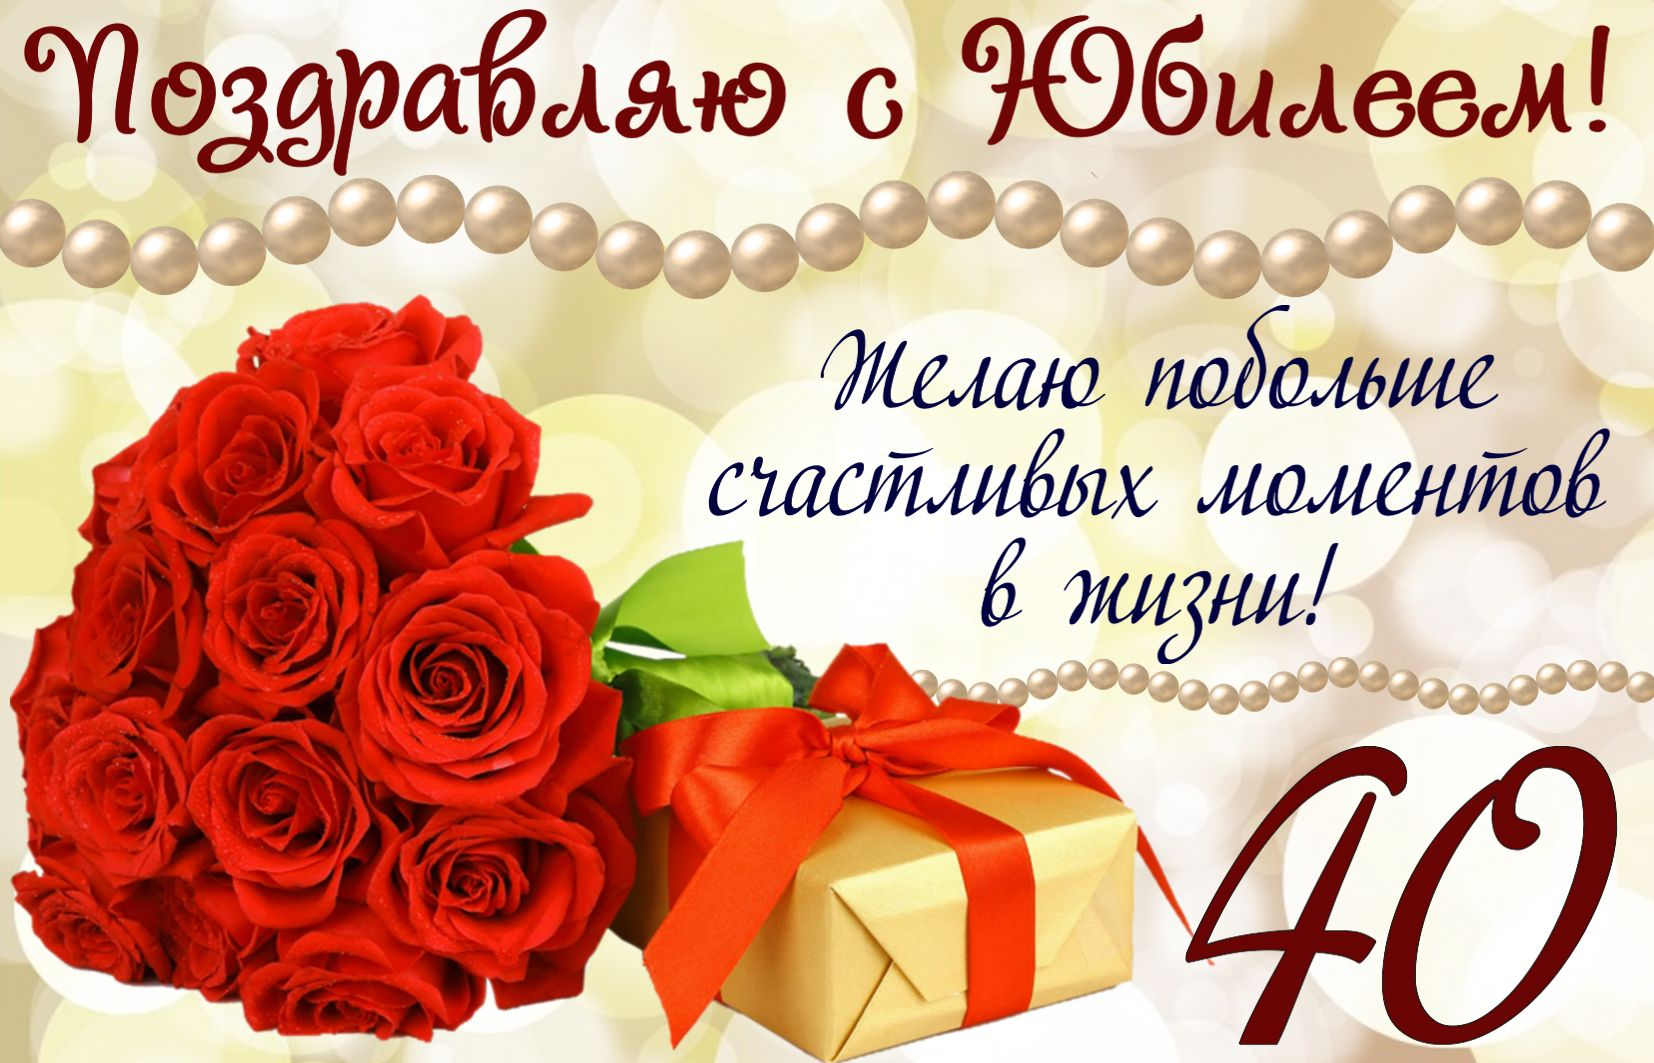 https://bonnycards.ru/images/yubiley/40-yubiley0026.jpg